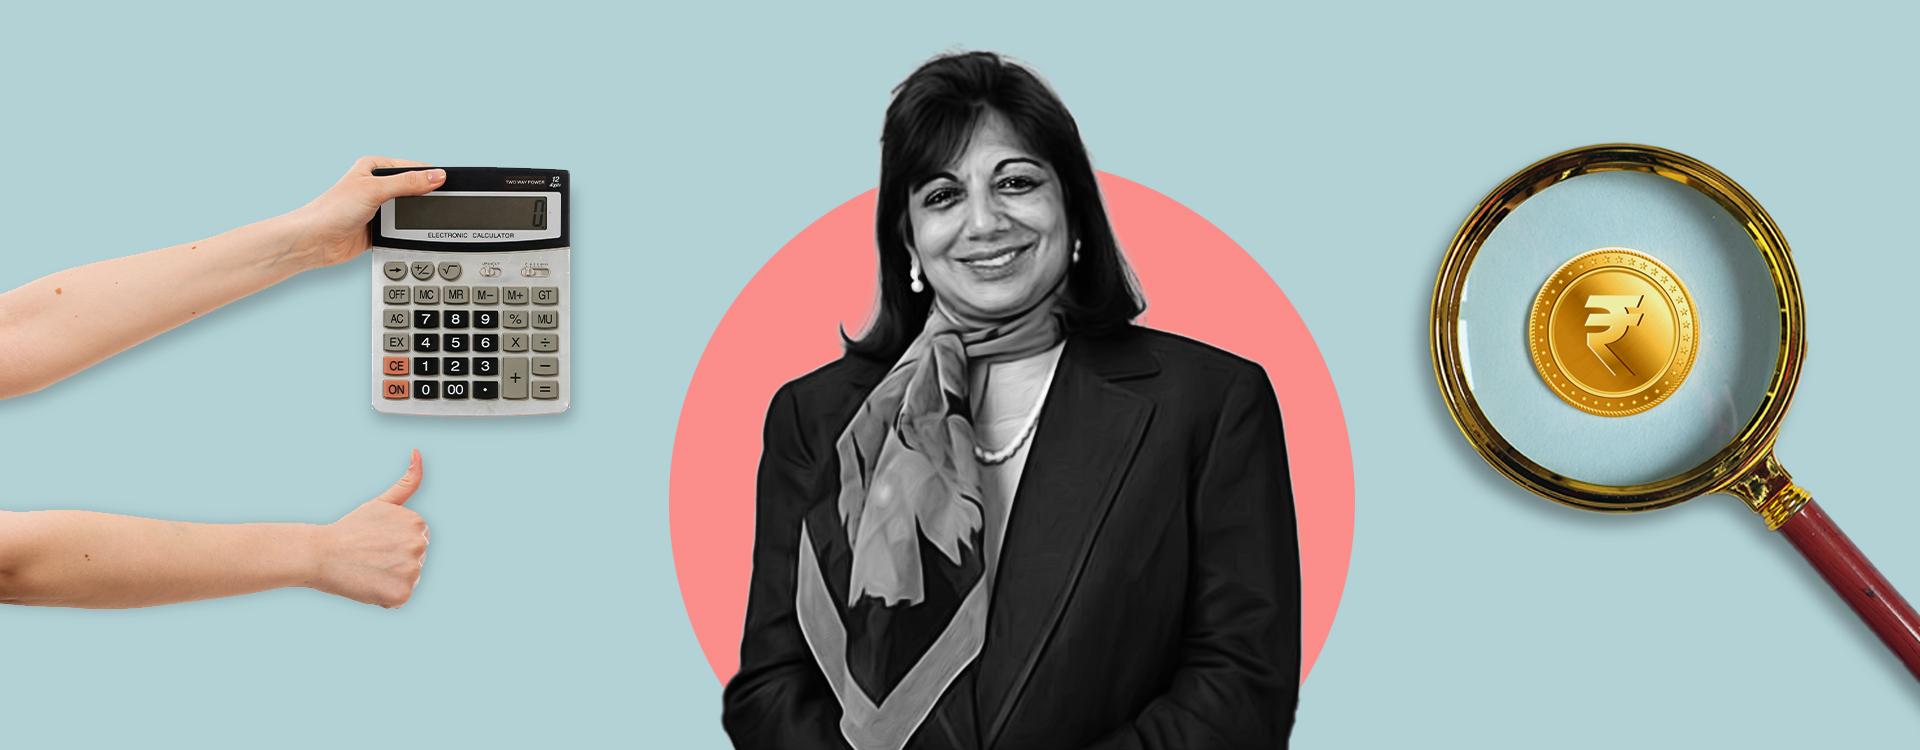 Kiran Mazumdar-Shaw, A successful women entrepreneur